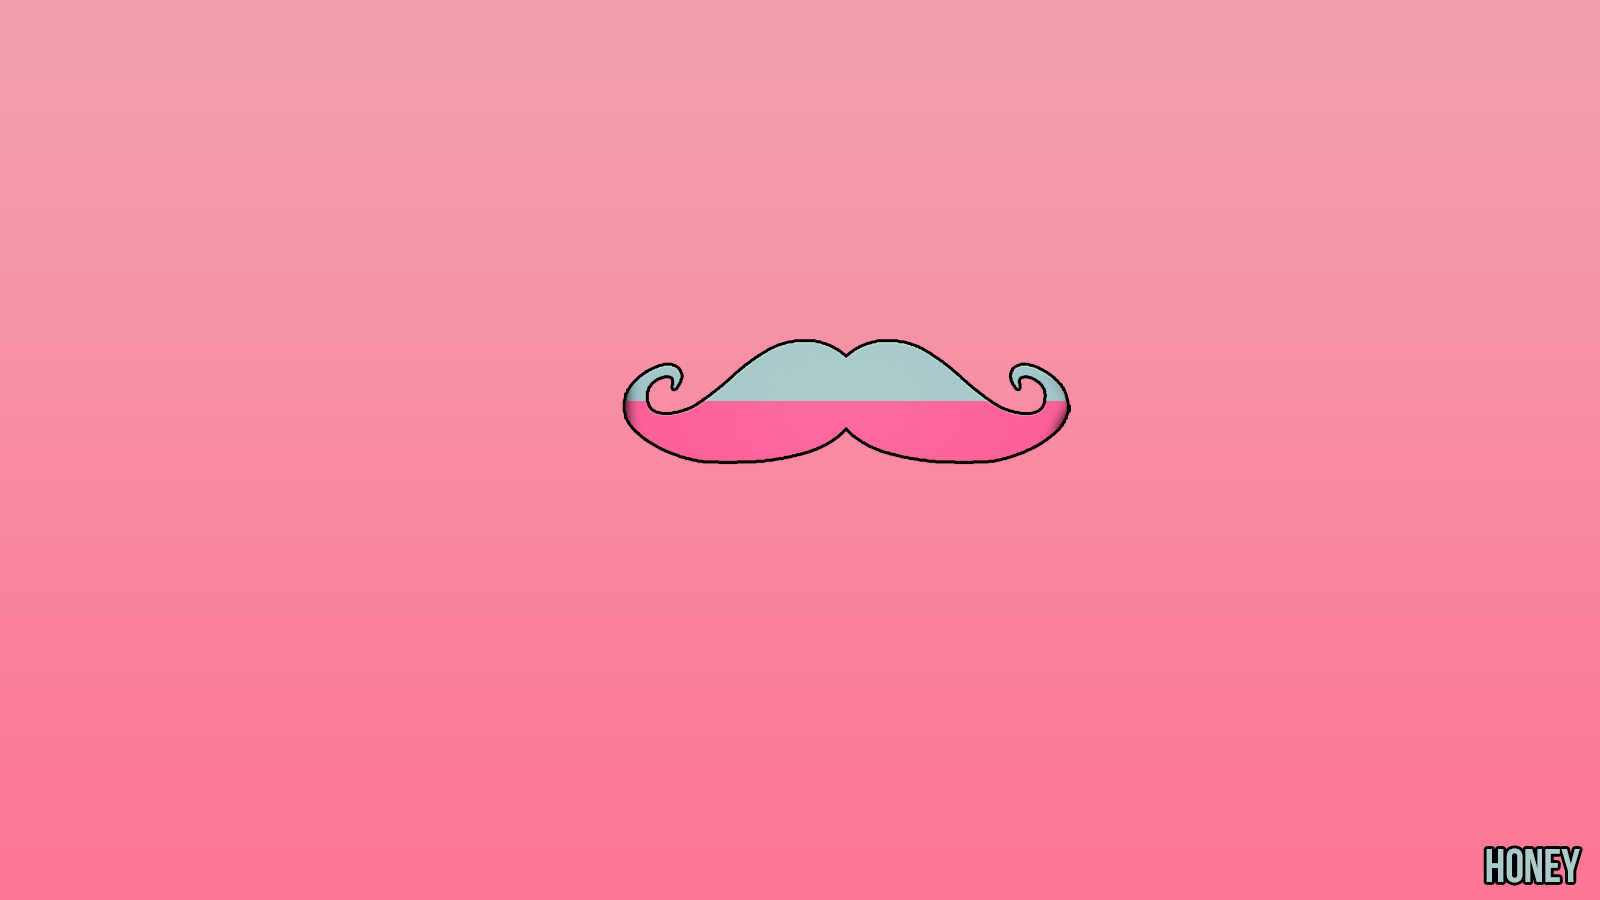 Wallpaper iphone tumblr mustache - Cute Mustache Wallpaper The Mustache Wallpaper By